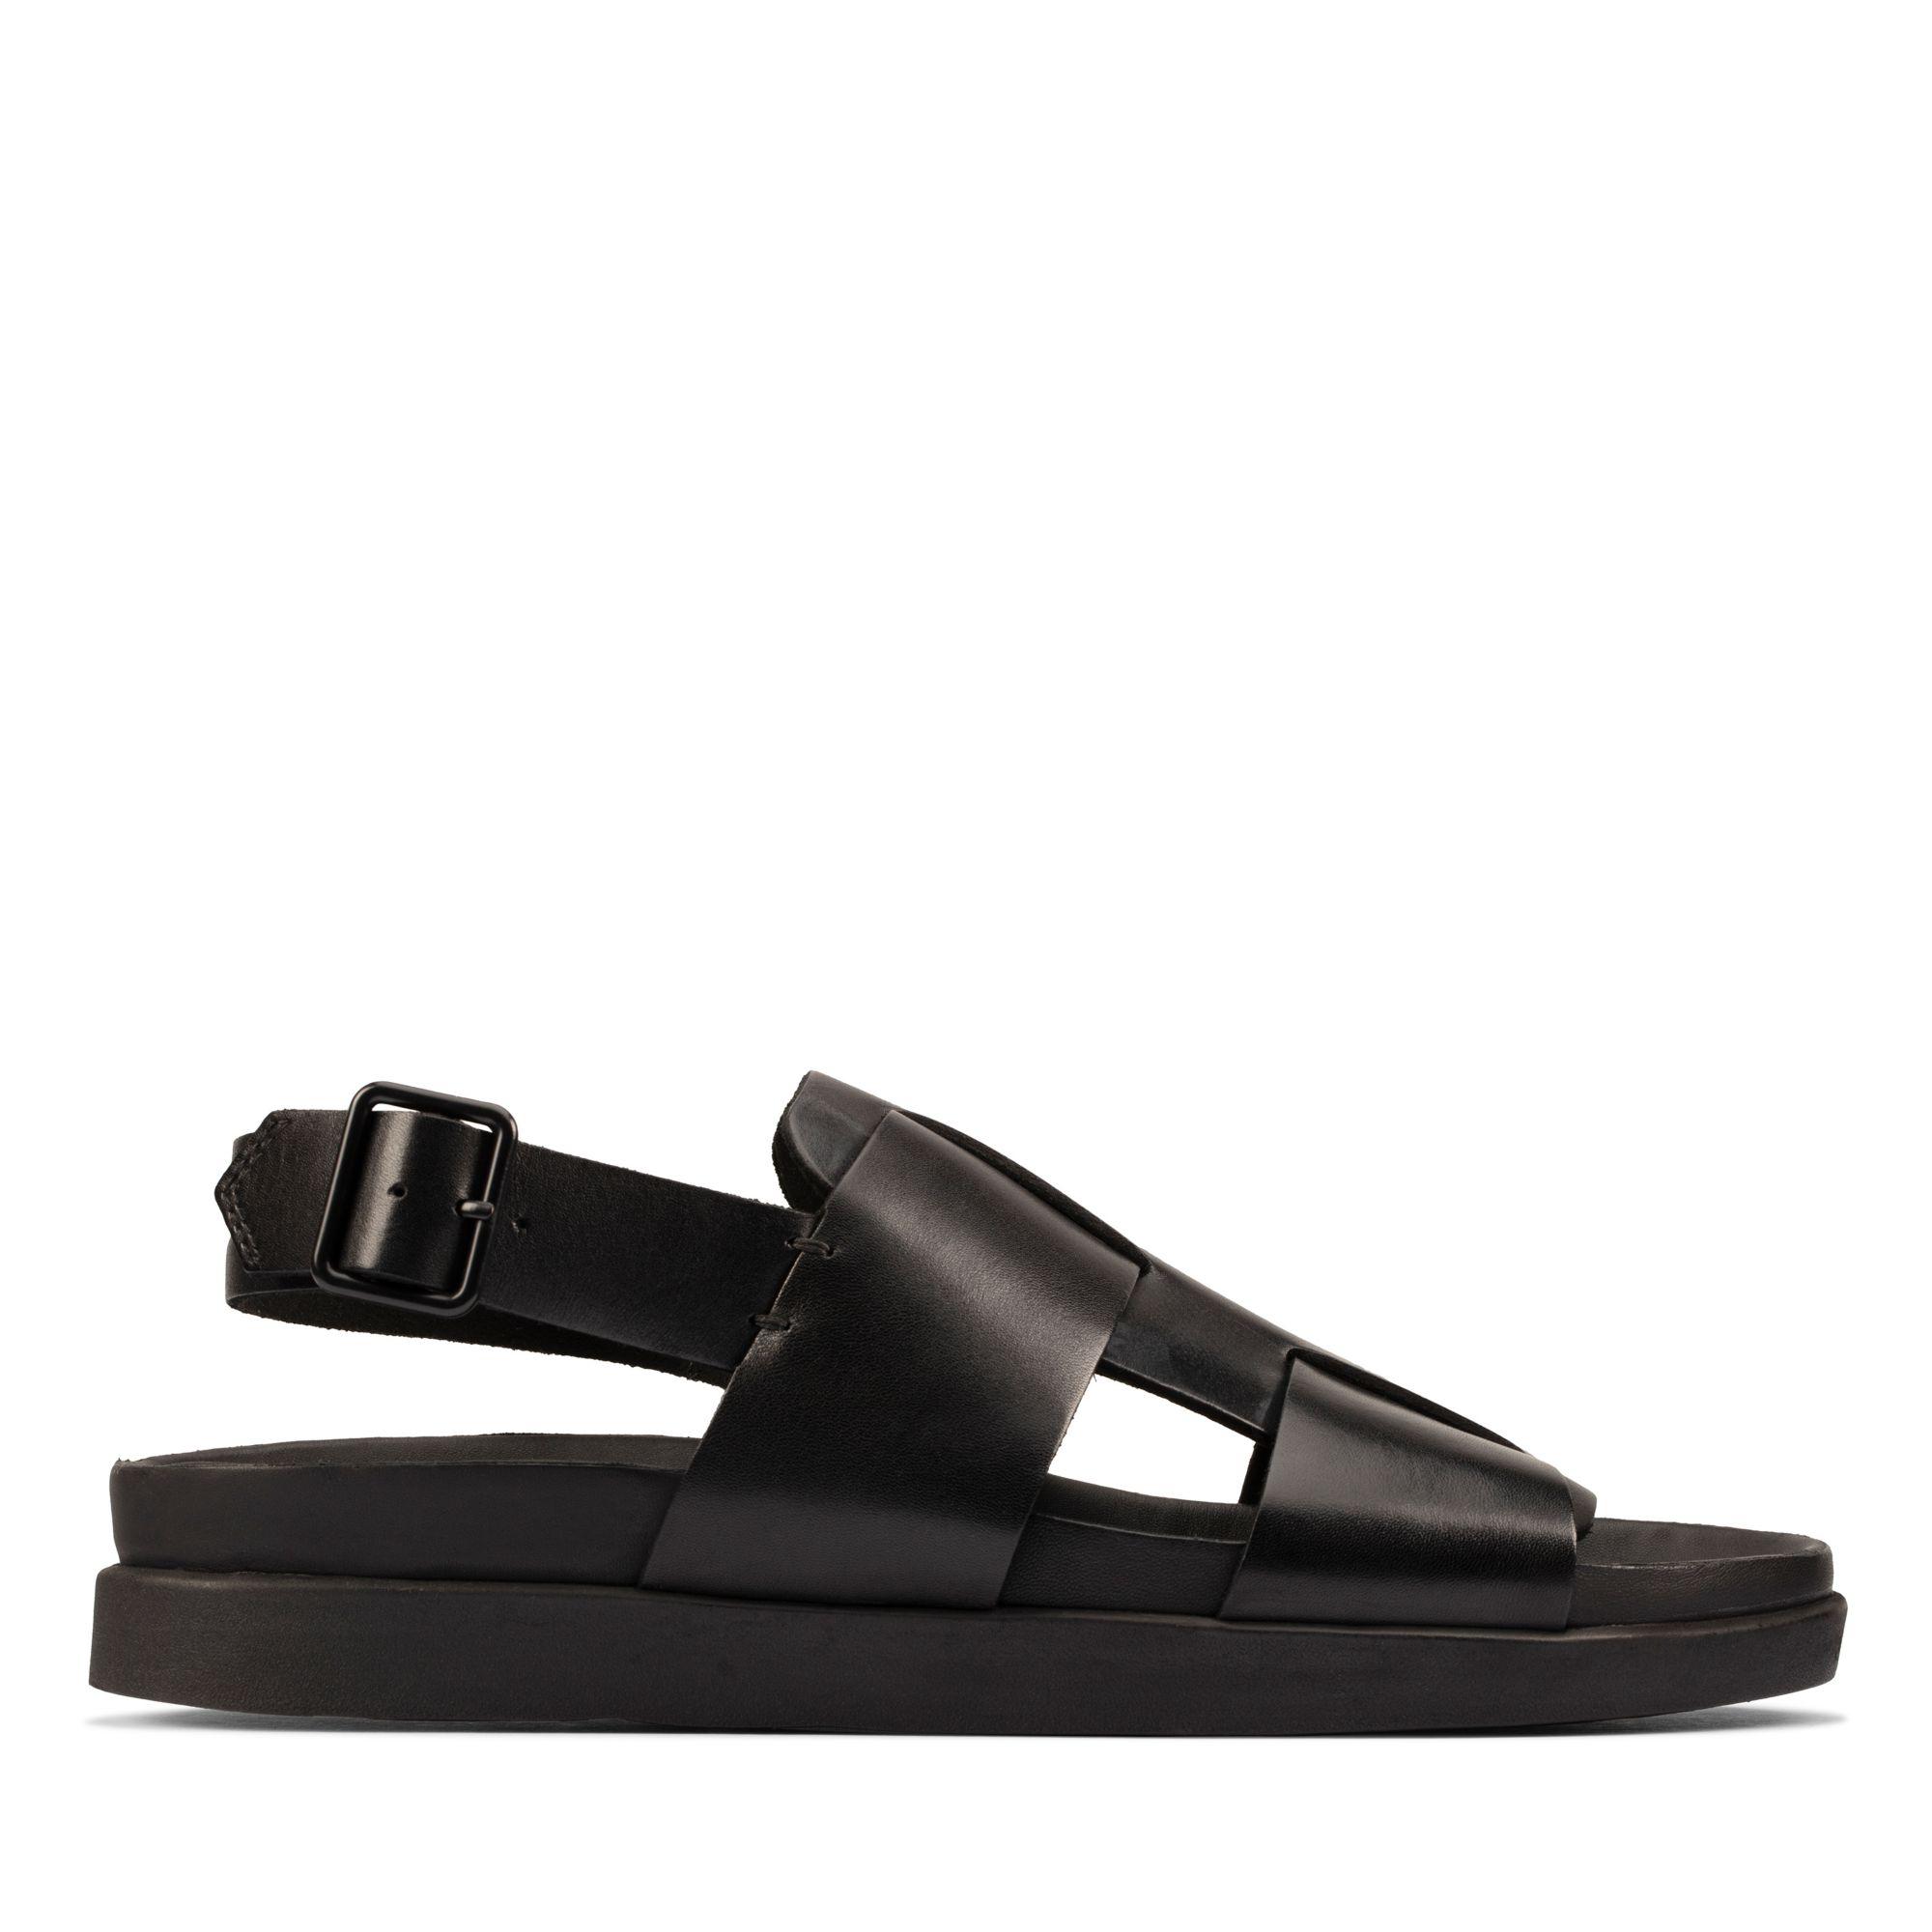 Clarks 夏日街頭-Sunder Strap輕量型休閒風扣環設計涼鞋(黑色)